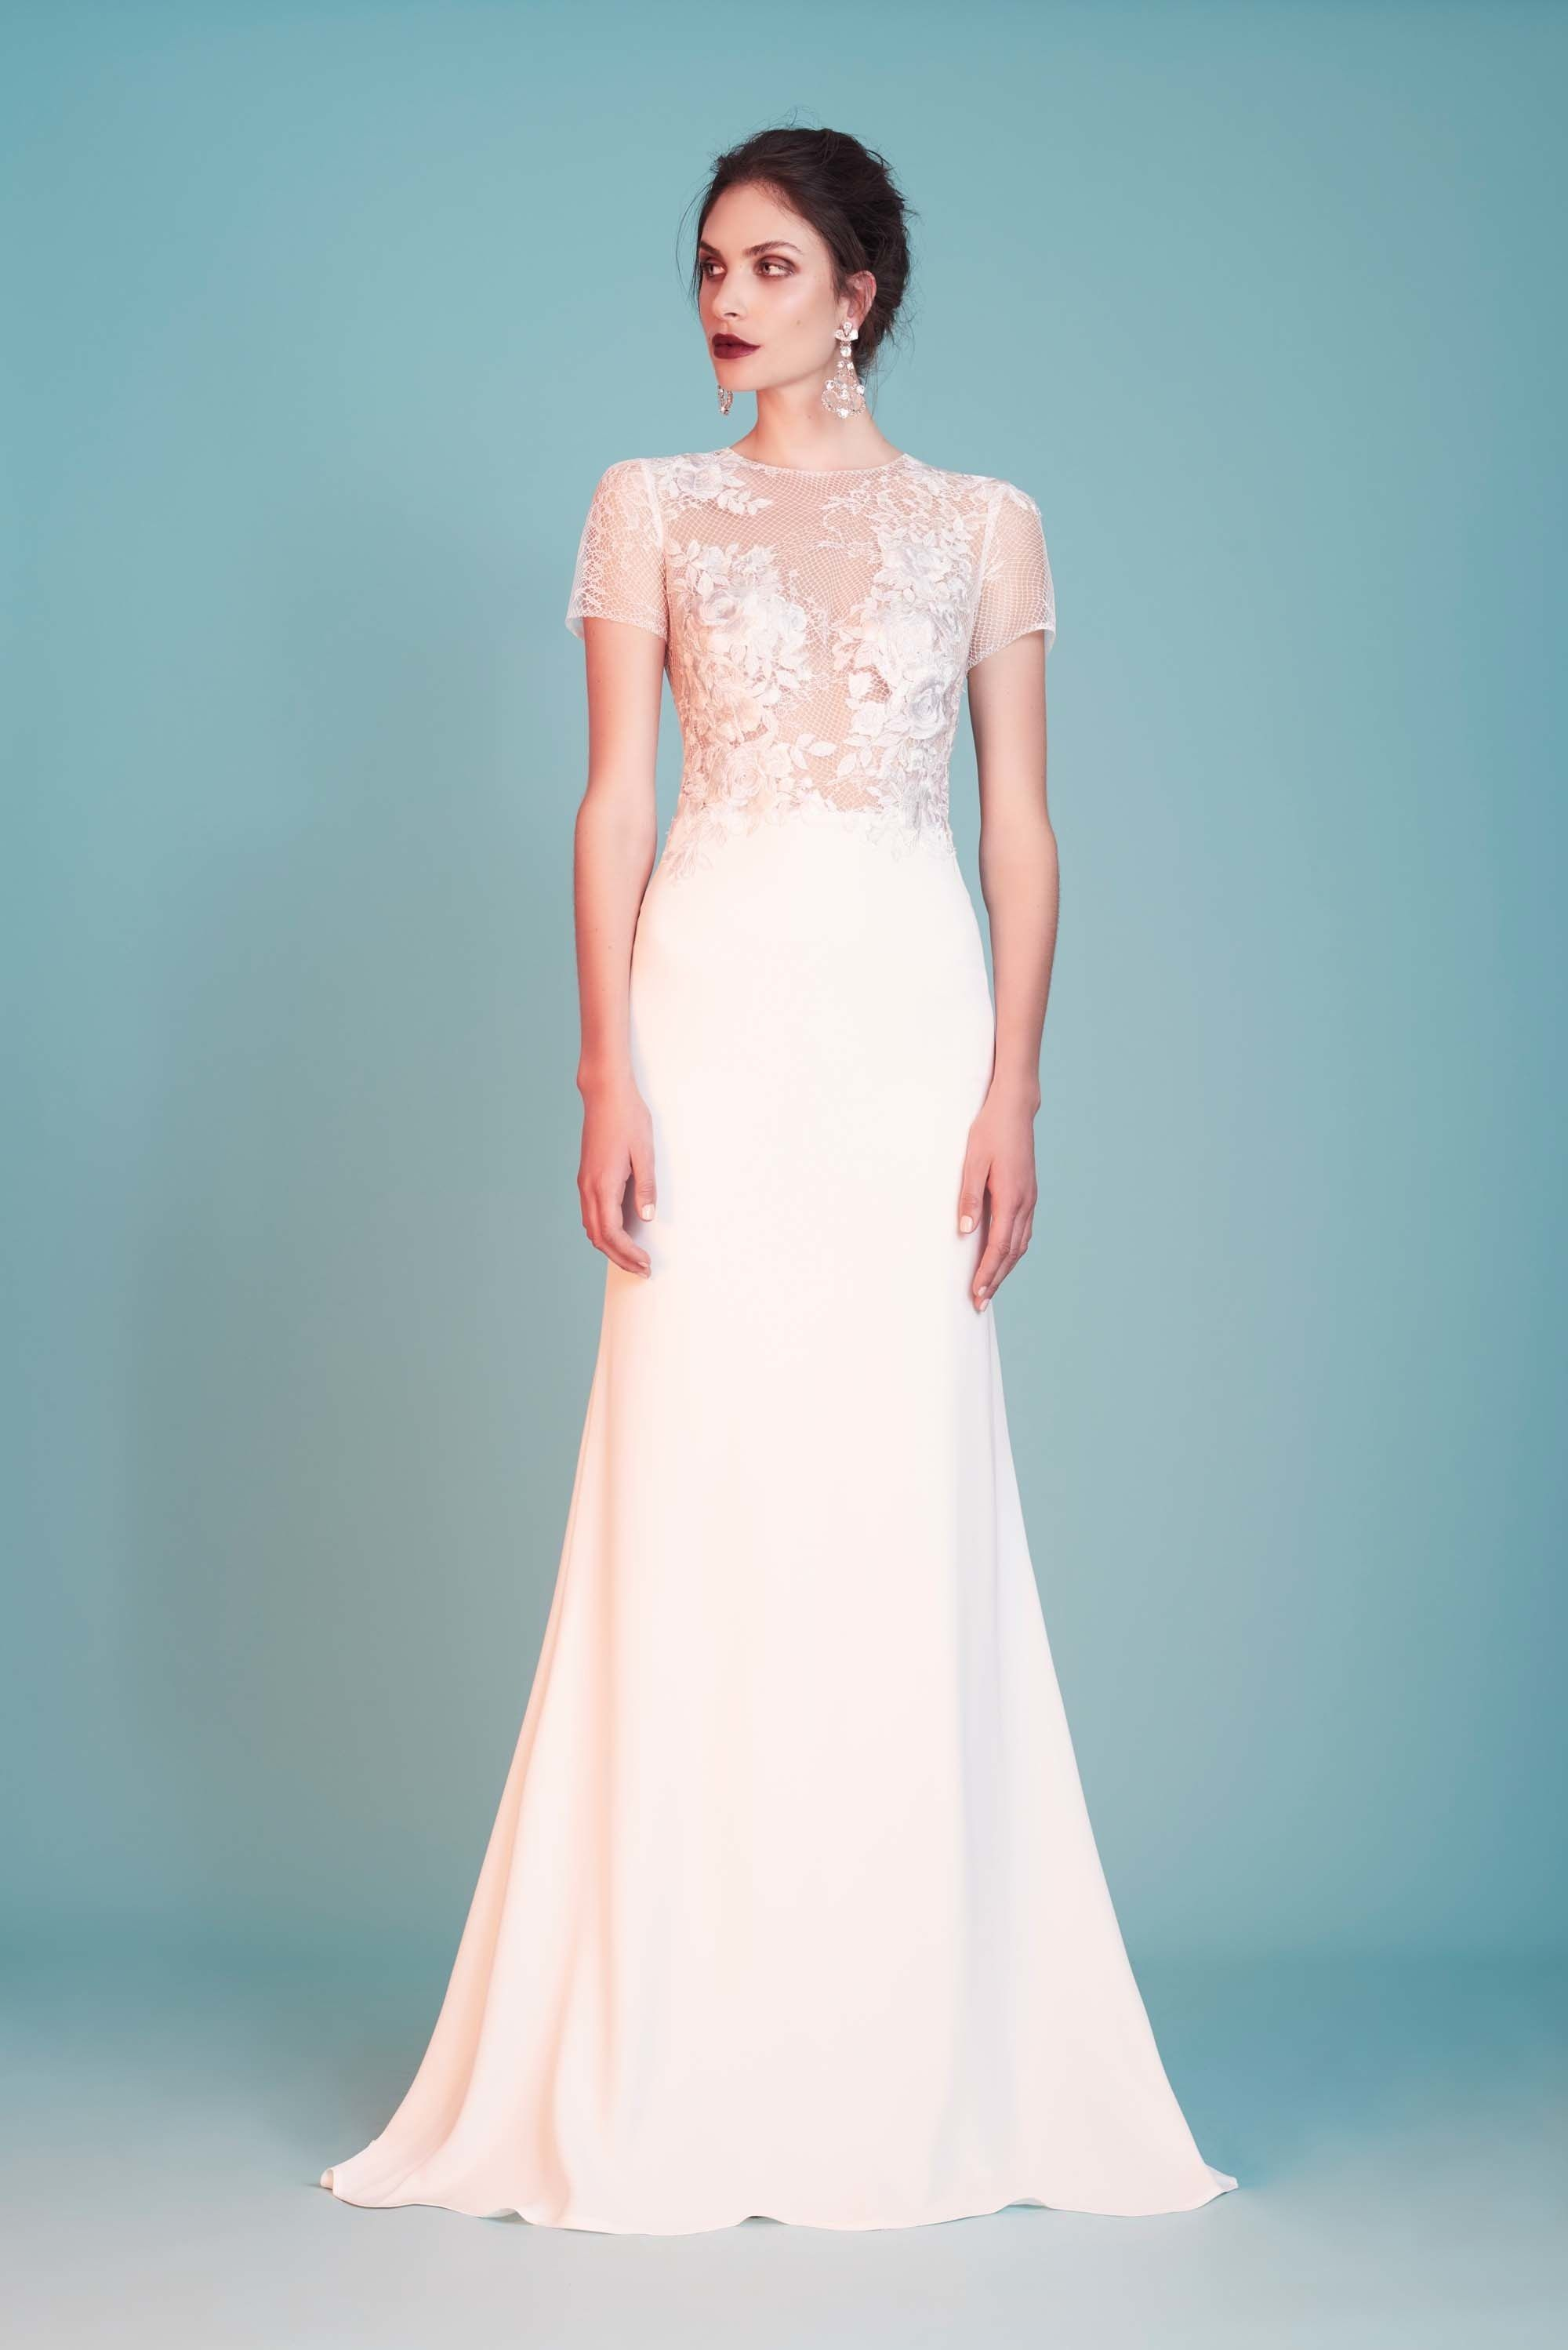 Tadashi Shoji Bridal Spring 2018 Fashion Show | Vestidos de novia ...